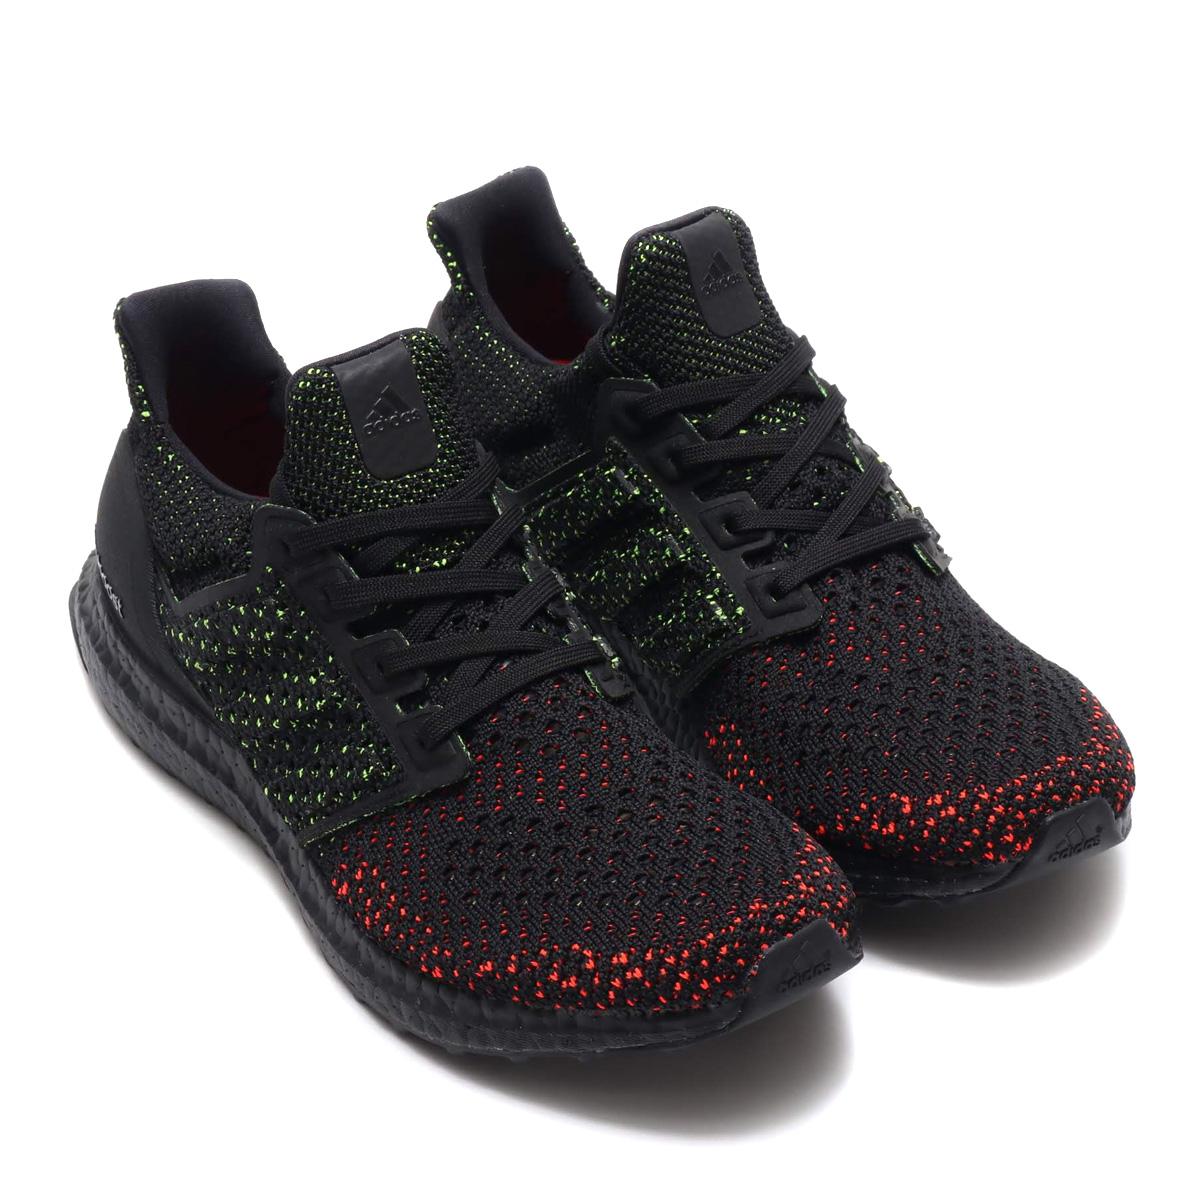 70acee01b65 adidas UltraBOOST CLIMA (アディダスウルトラブーストクライマ) core black   core black   solar  red 18FW-I